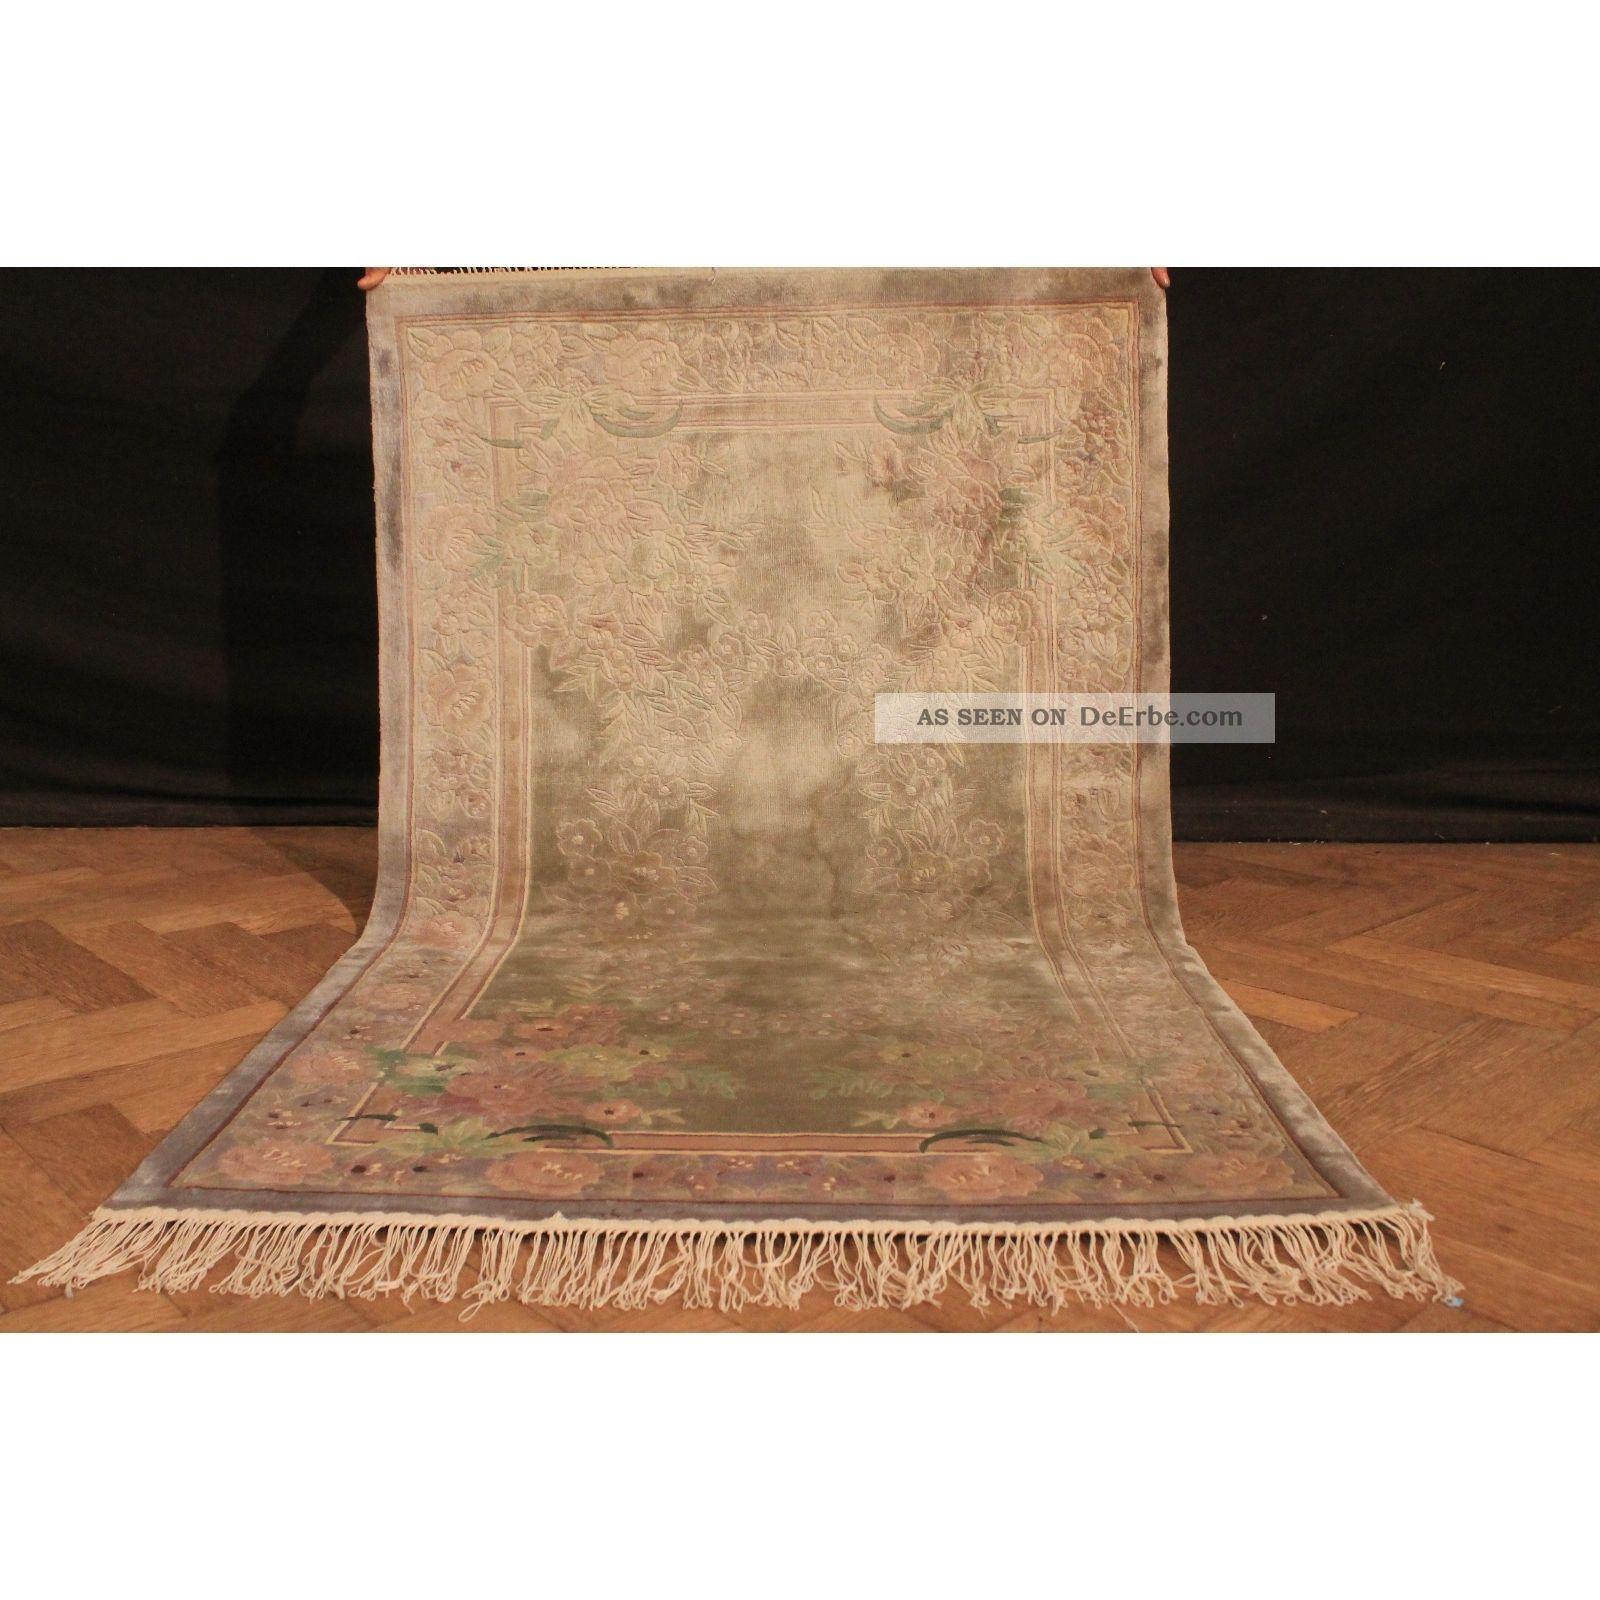 Fein Handgeknüpfter Seiden China Art Deco Peking Teppich Silk 150x90cm Carpet Teppiche & Flachgewebe Bild